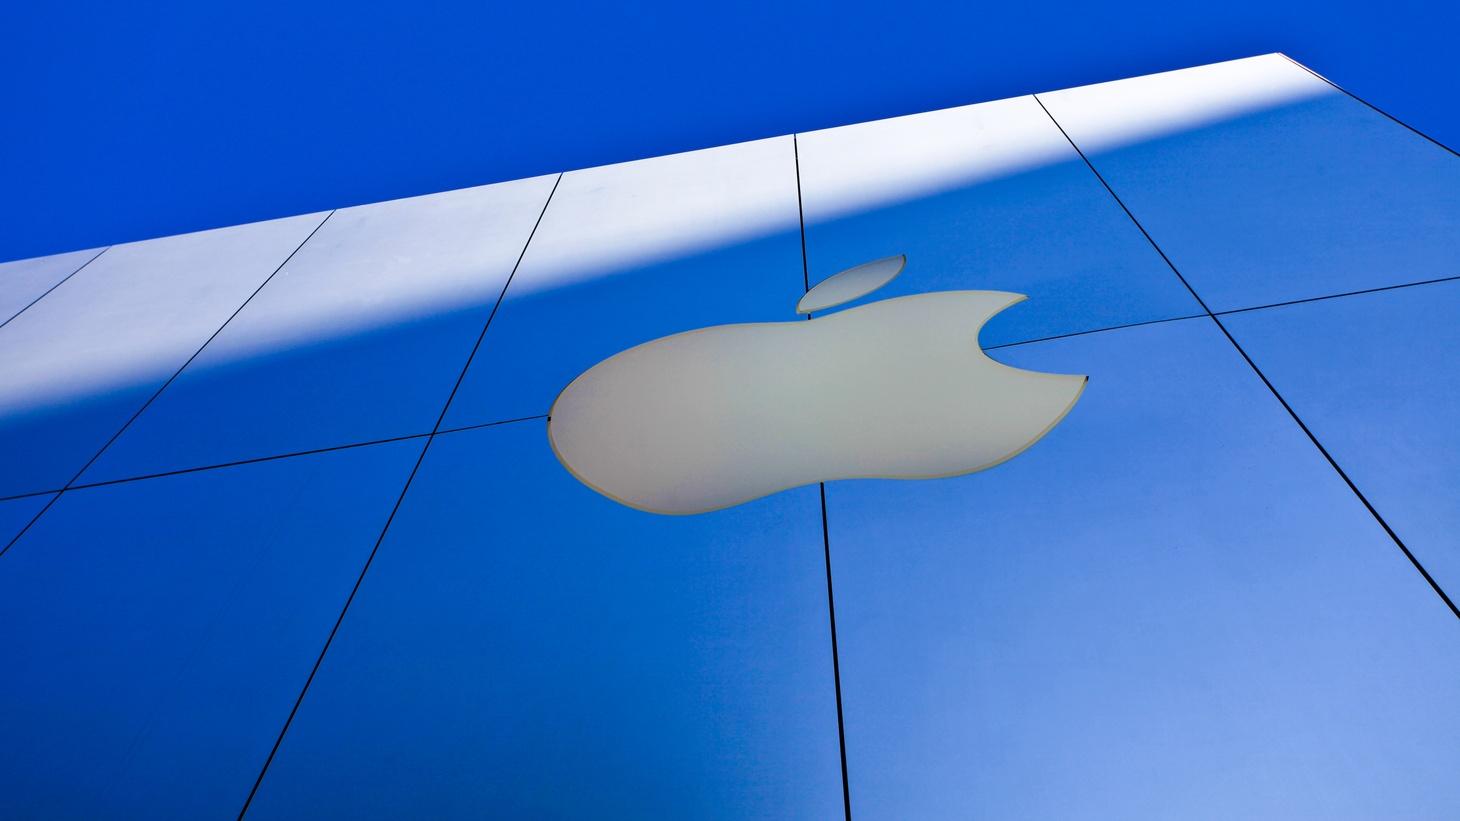 Apple store in San Francisco.